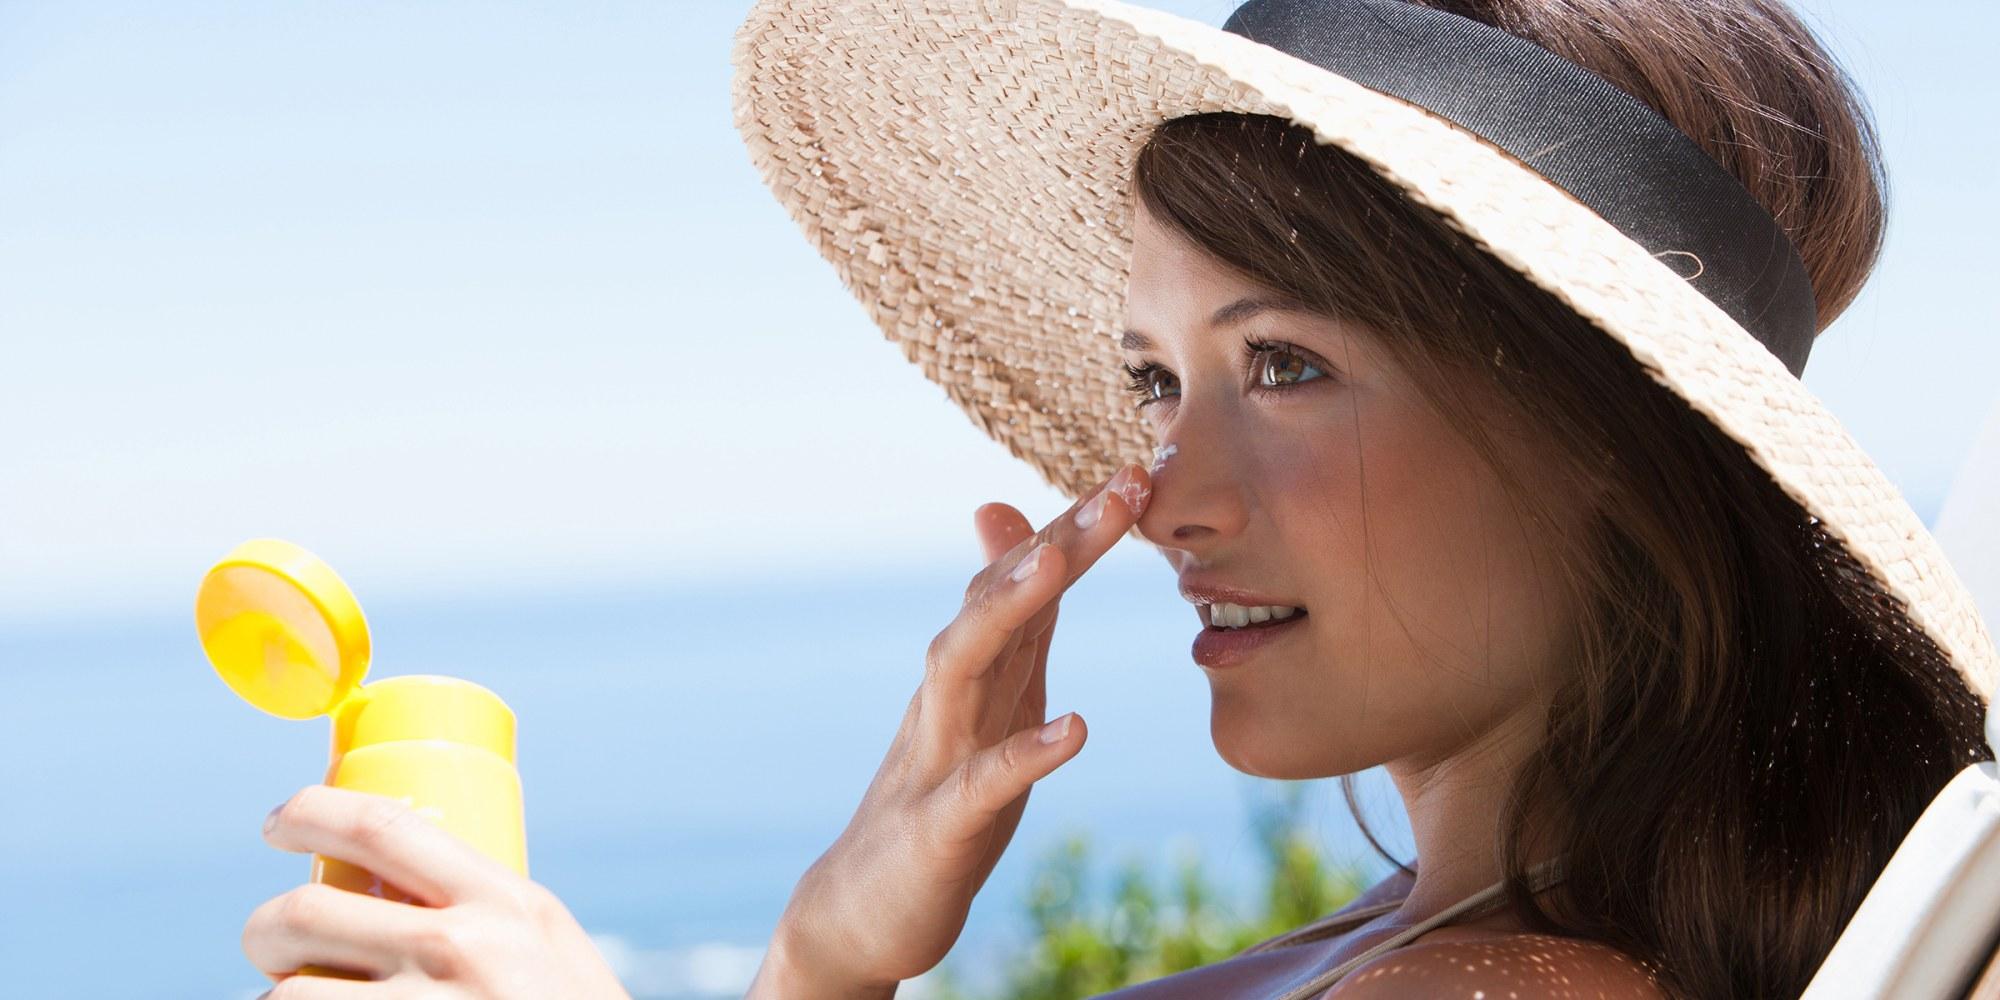 Don't skip eyelids when applying sunscreen